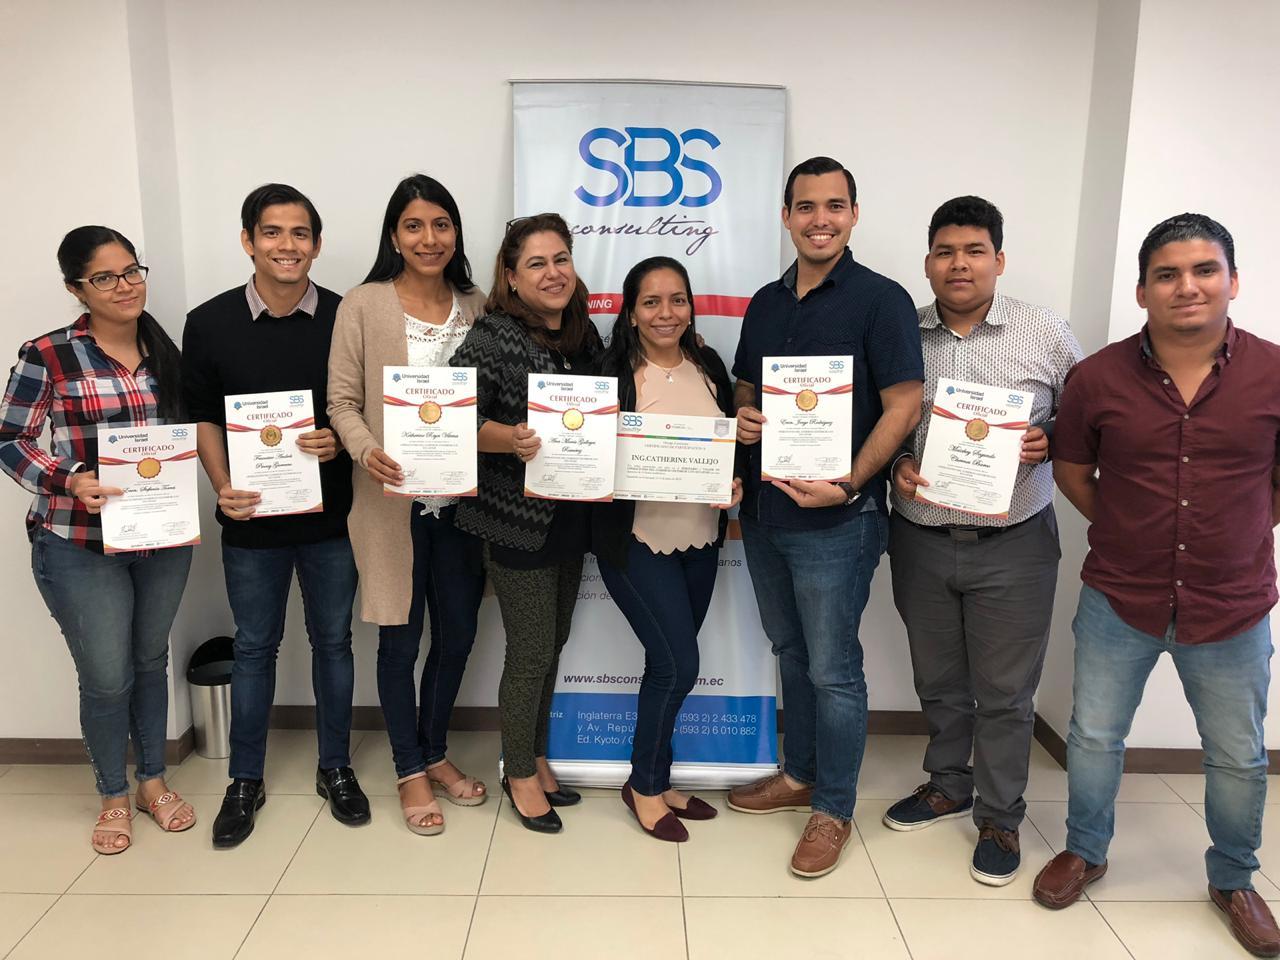 Operaciones del Comercio Exterior con ECUAPASS Guayaquil